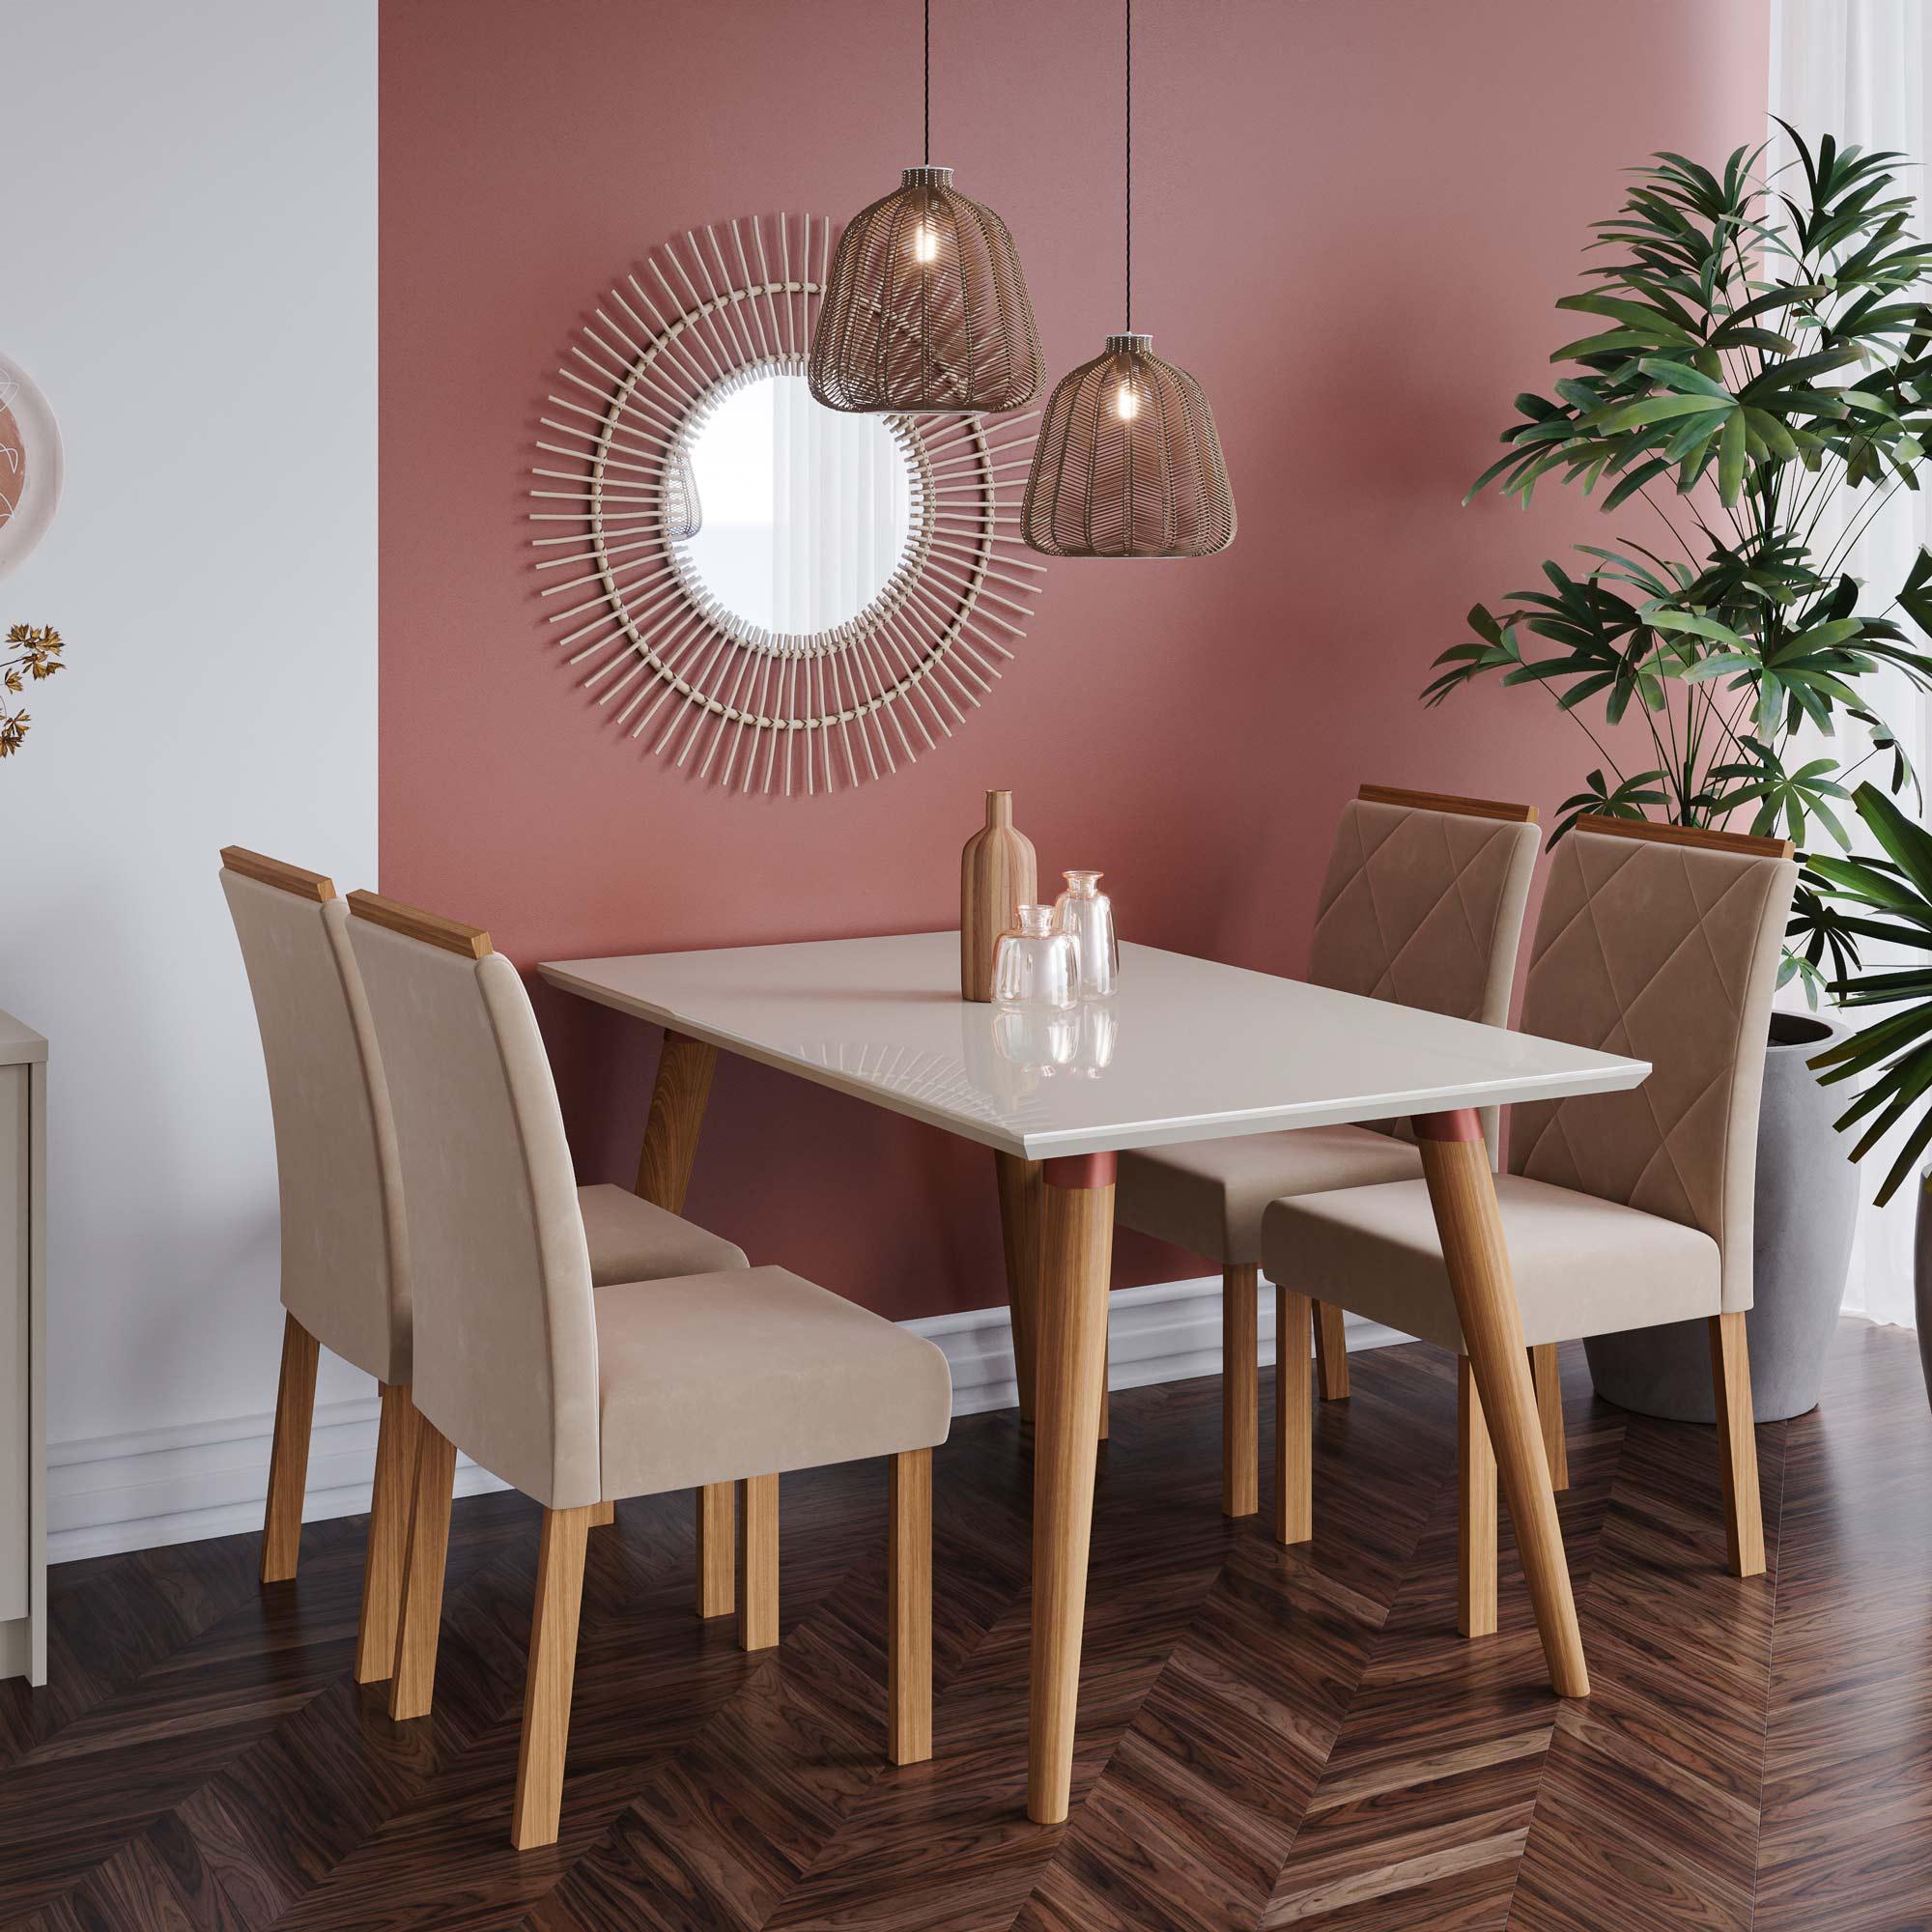 Mesa para Sala De Jantar Adele 130 x 80 cm e 4 Cadeiras Fernanda Cimol Madeira/Off White/Nude